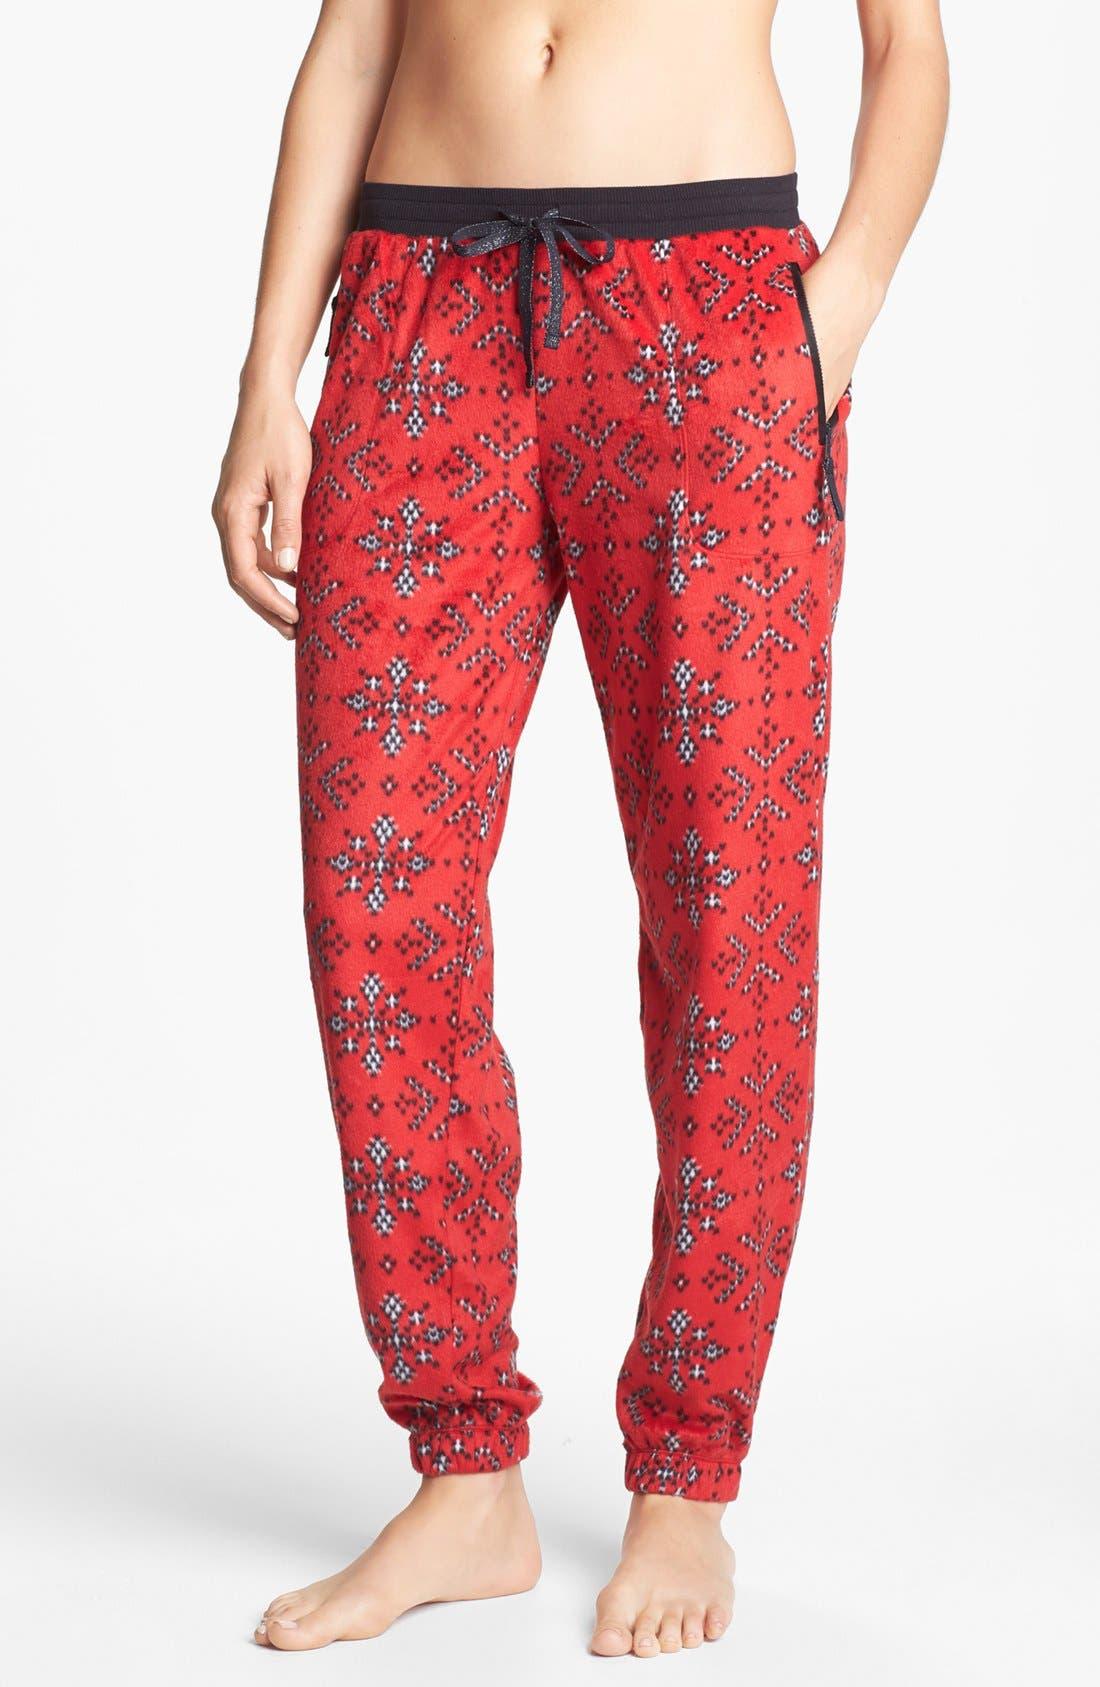 Alternate Image 1 Selected - kensie 'Chilled Out' Fleece Ski Pajama Pants